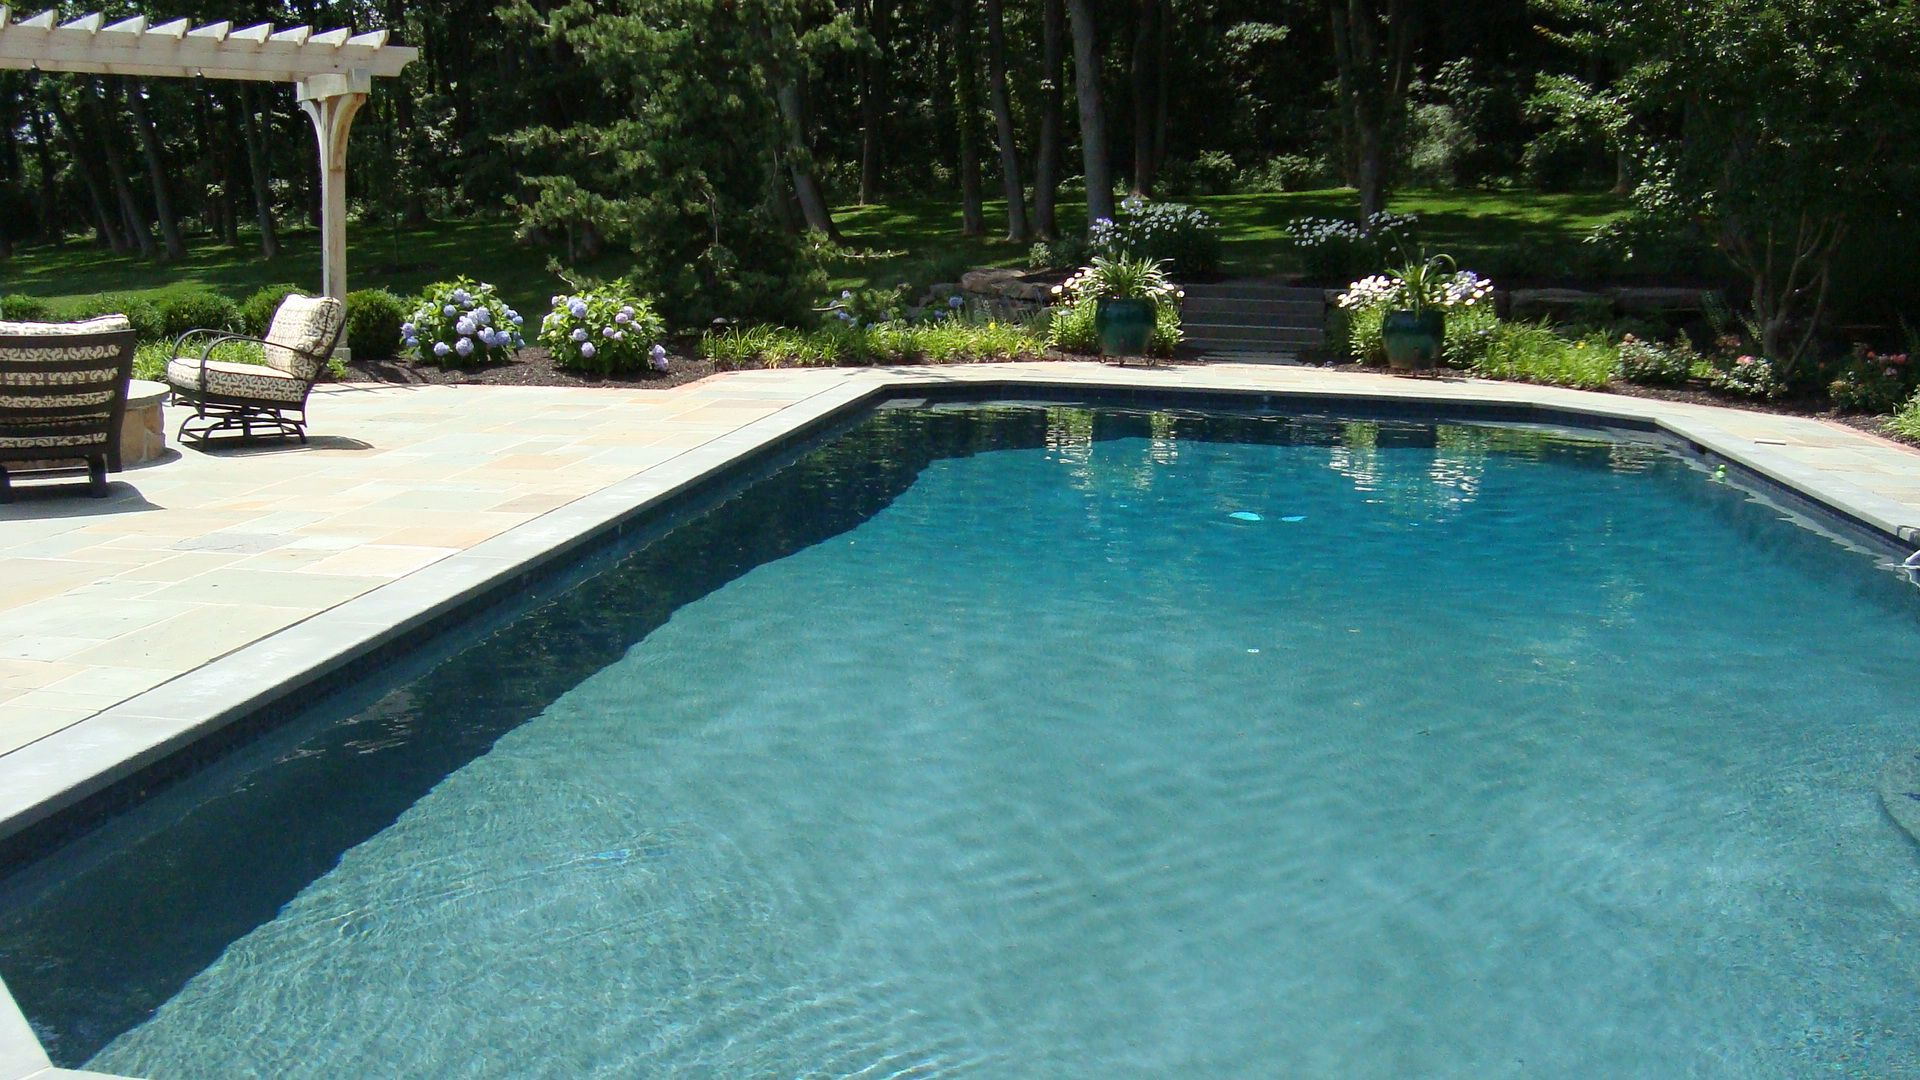 Rectangle Pool With Blue Stone Coping Aqua Bello Designs Custom Swimming Pools Spas